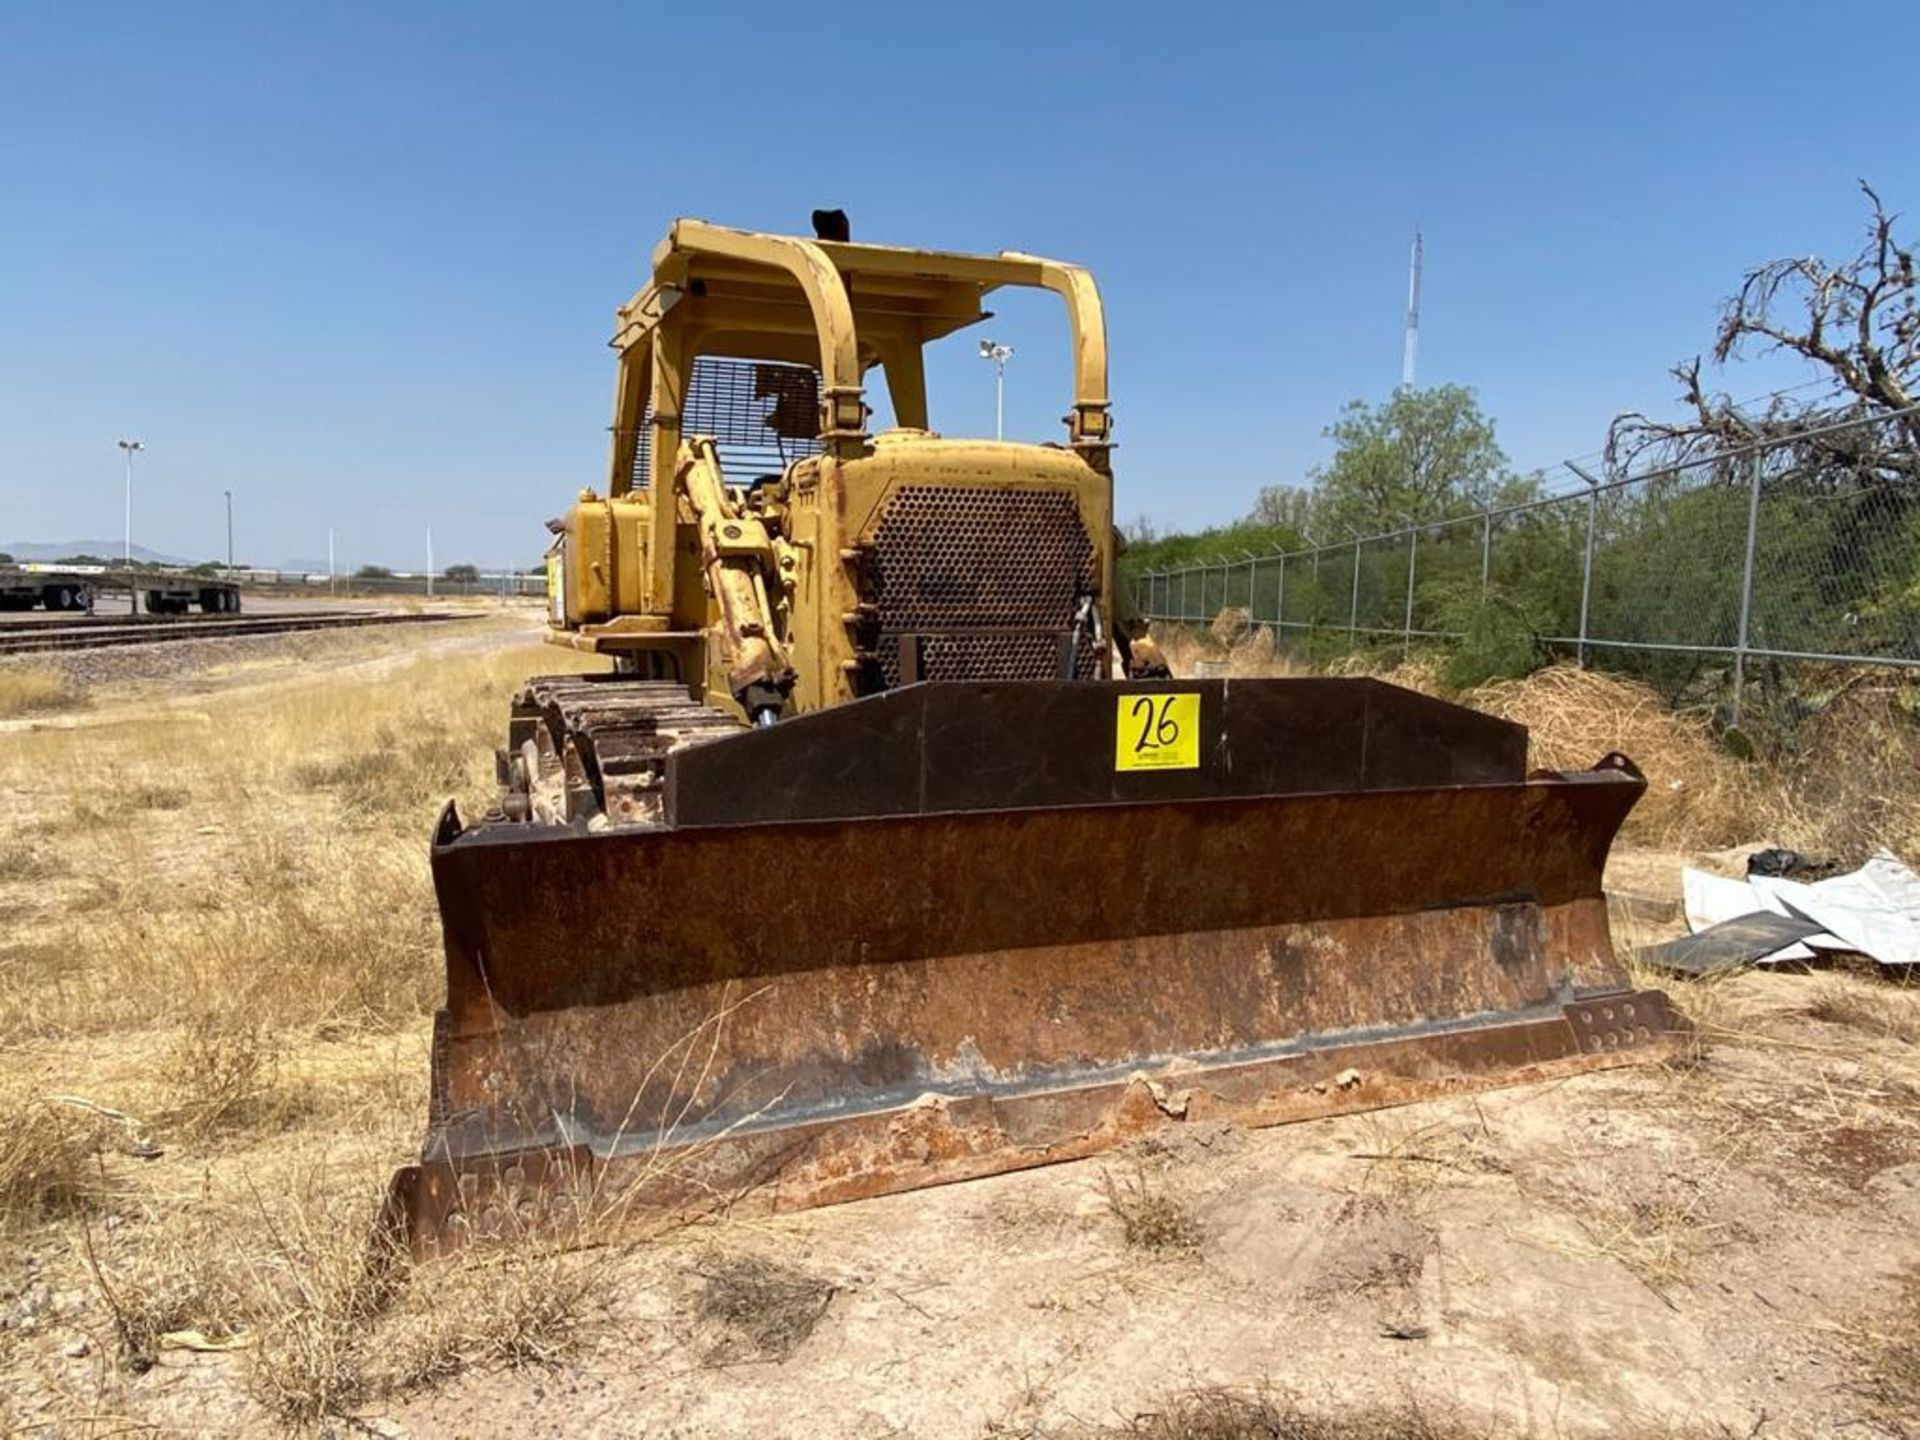 Caterpillar D7G Bulldozer, Serial number 92V5897, Diesel motor - Image 3 of 48